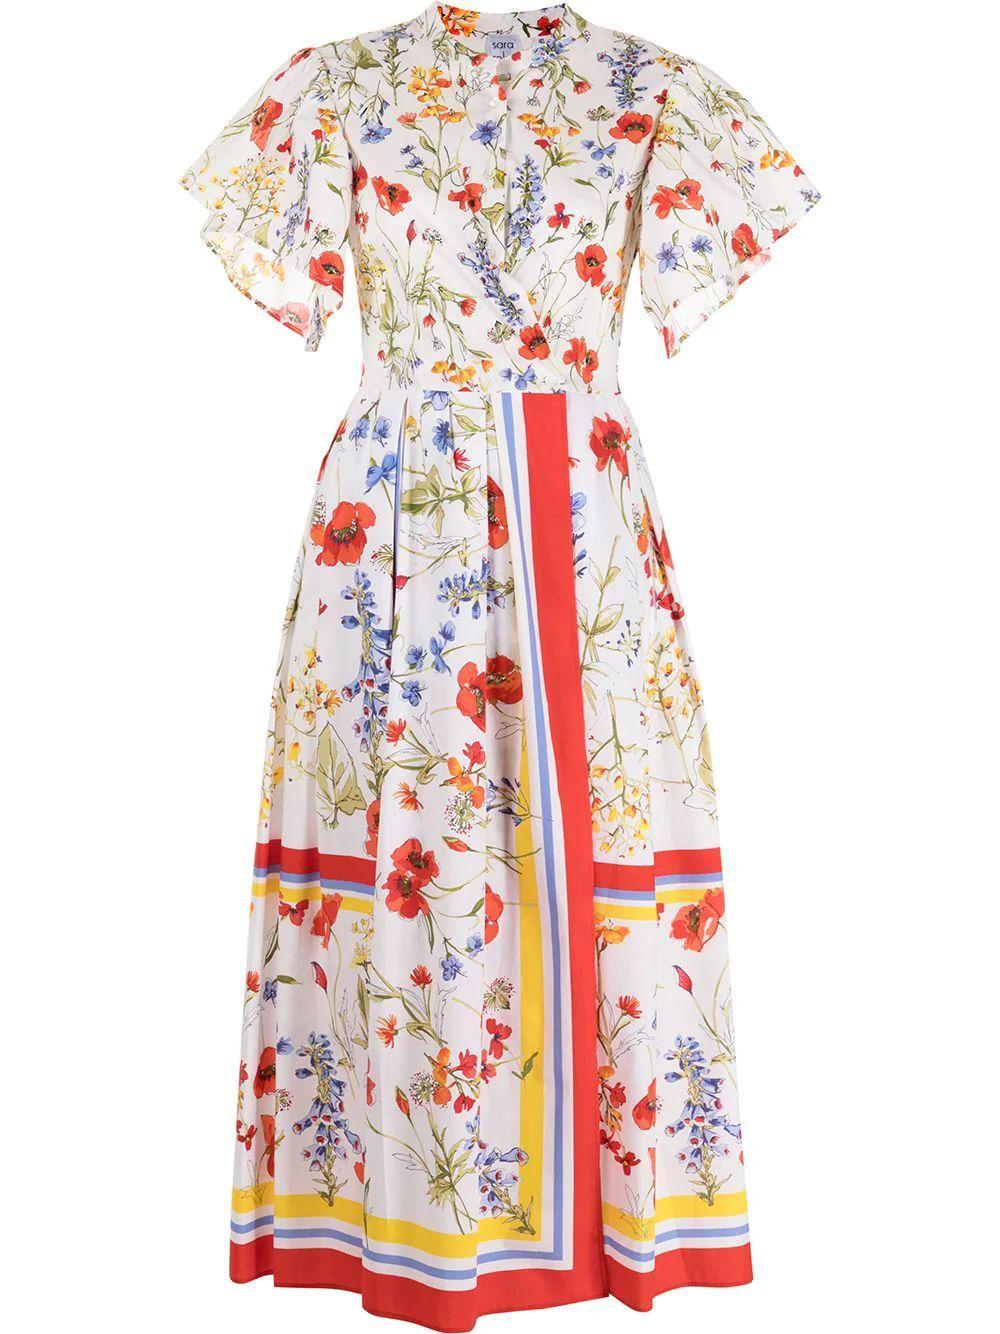 Fiore Wild Floral Shirt Dress Item # FIORE3130A-SS21